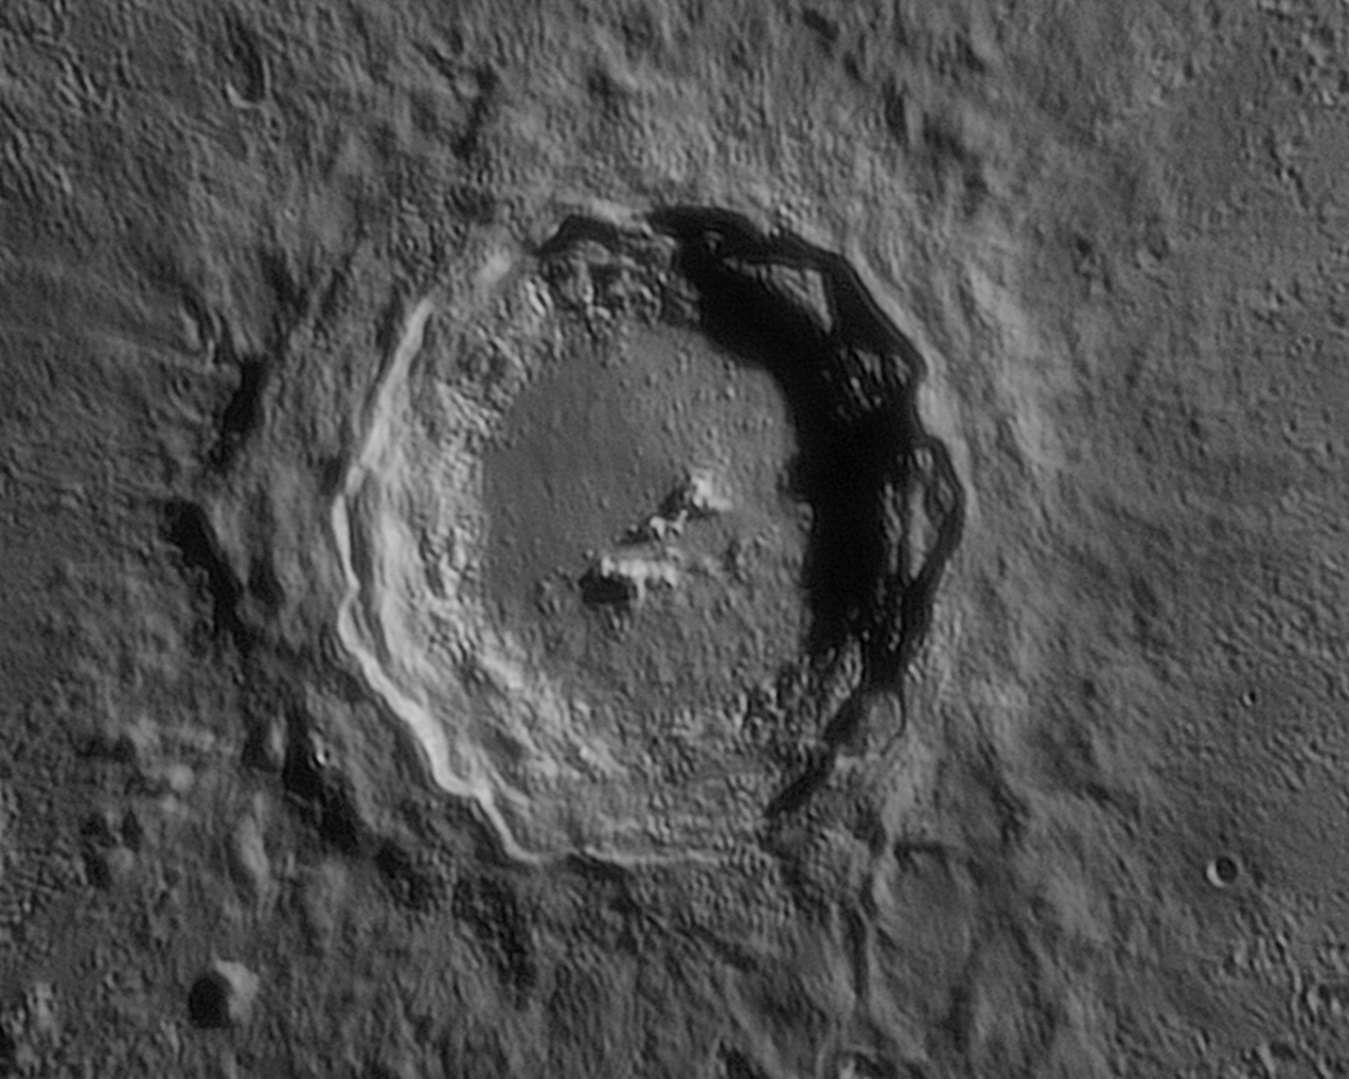 Krater Kopernik 20190414_210416_g3_ap609_conv crop.jpg